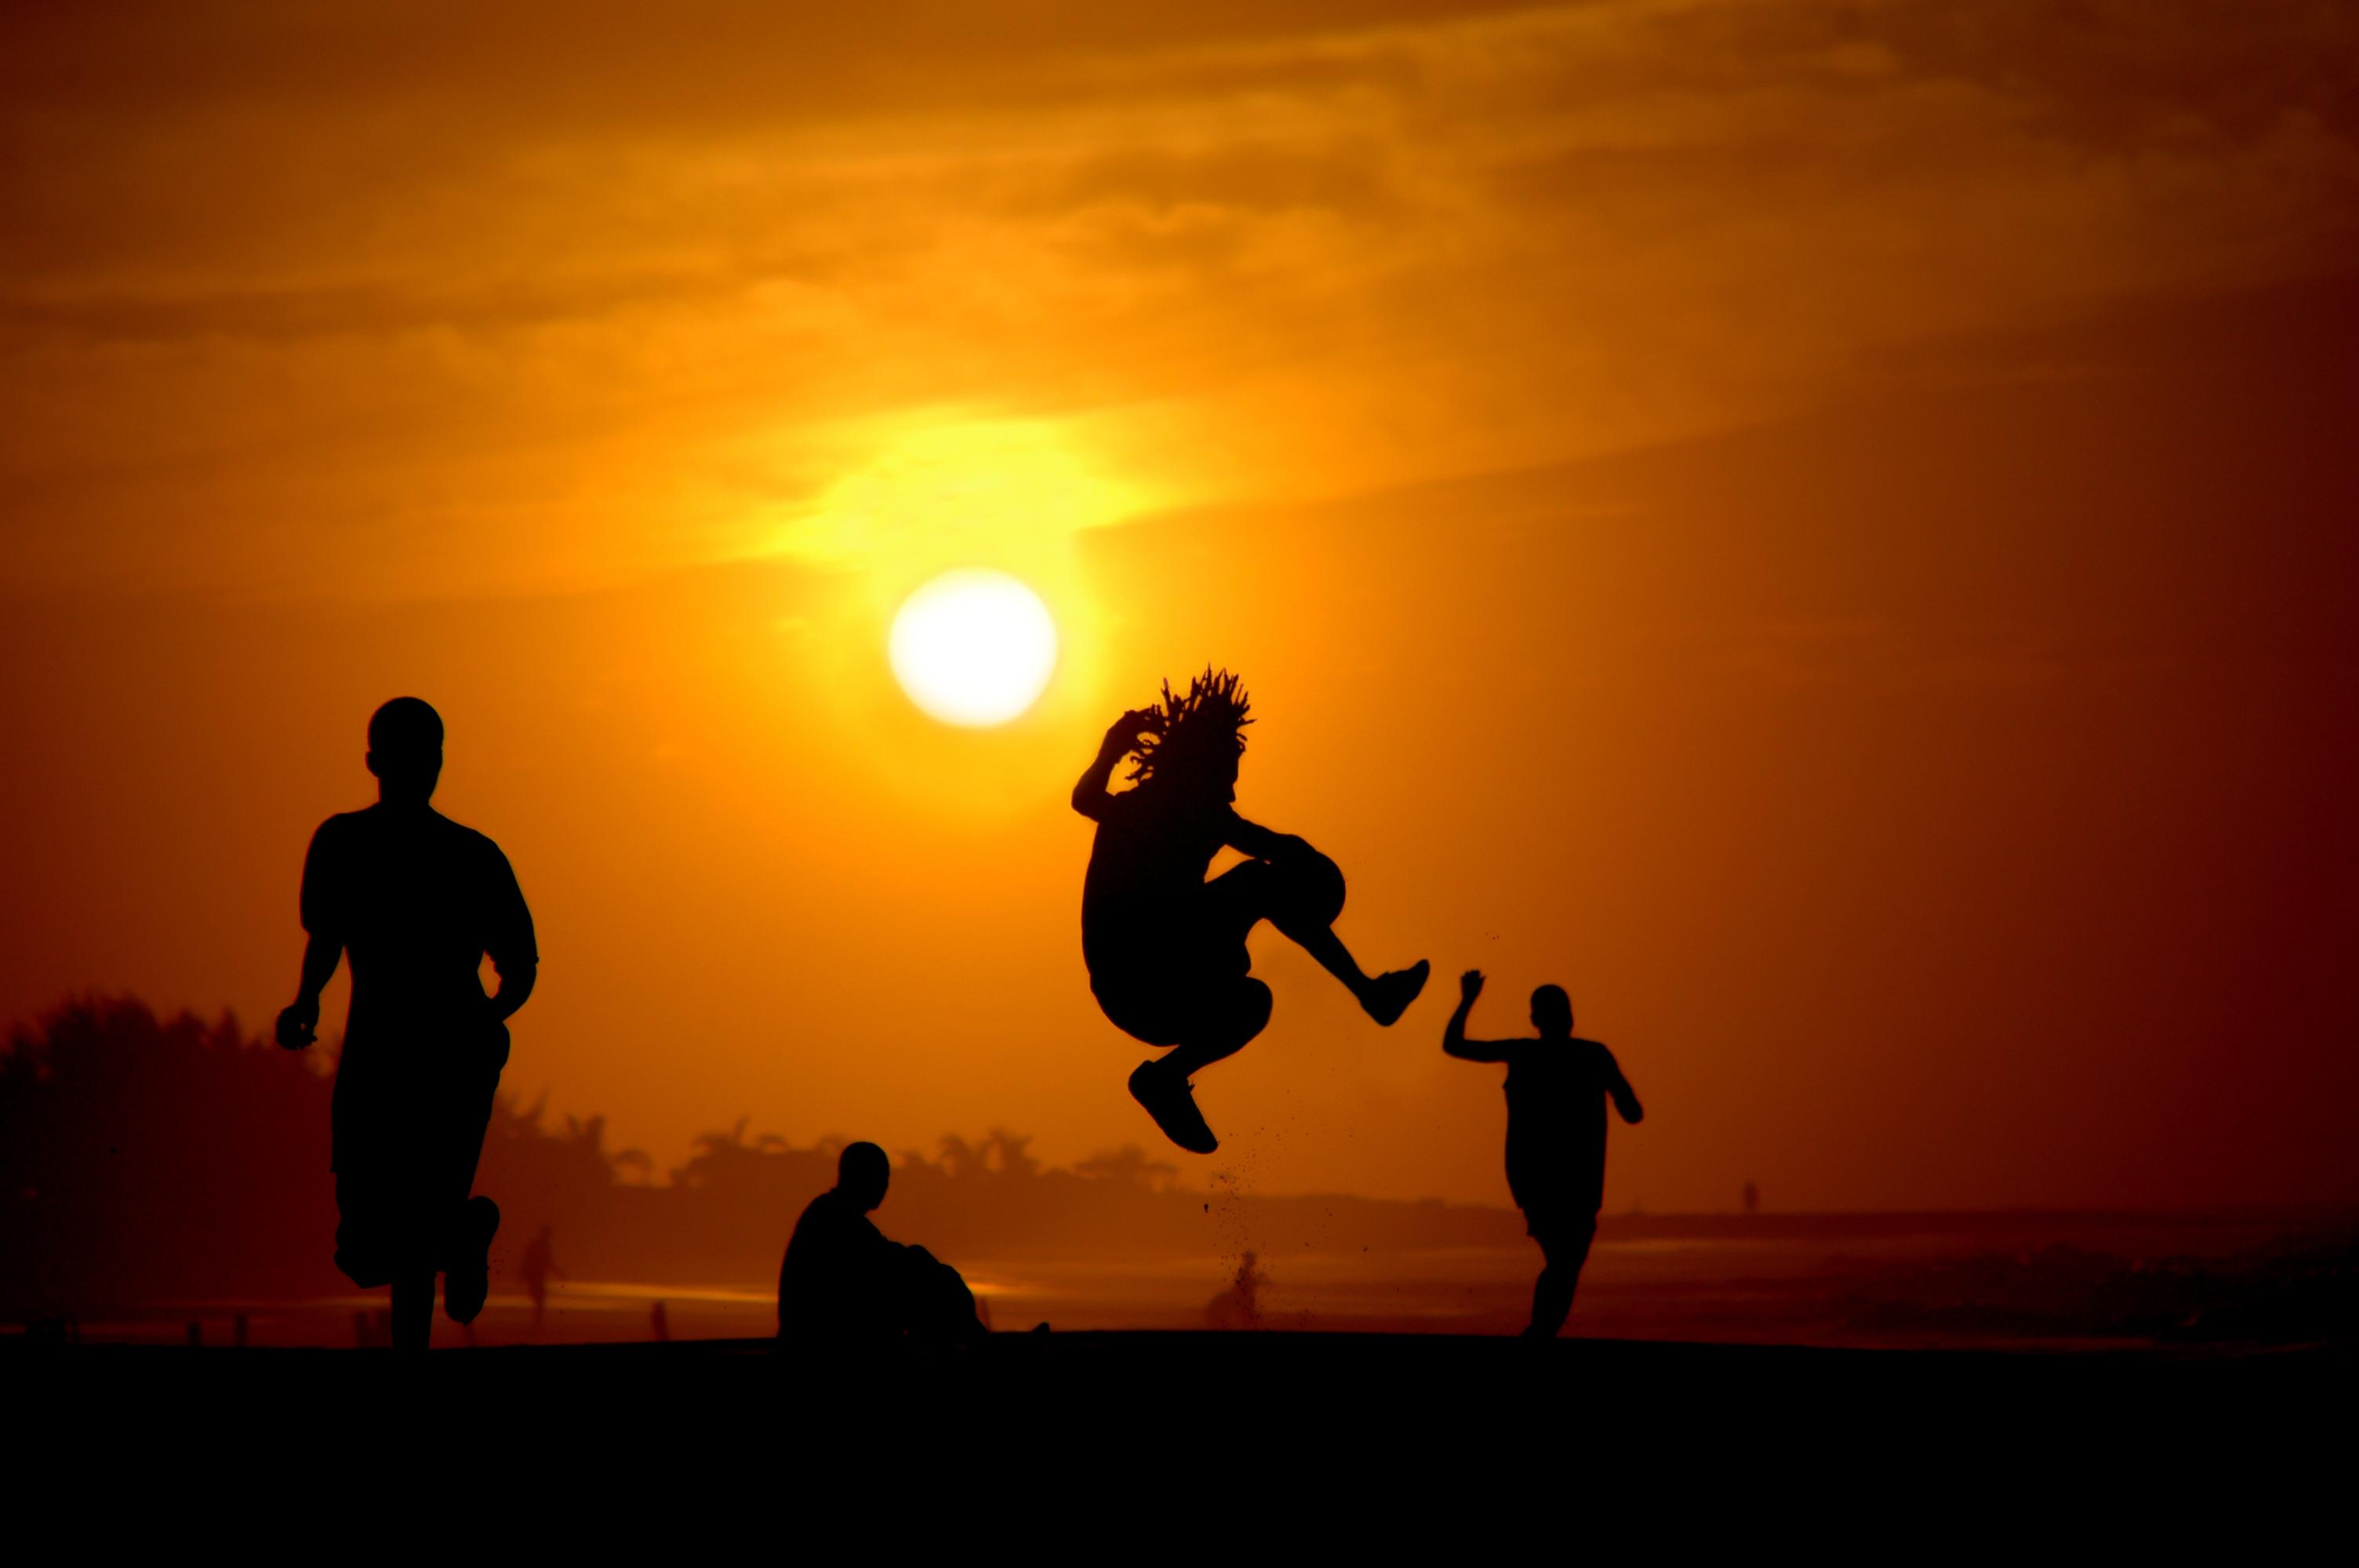 Football on the Gambian Coast